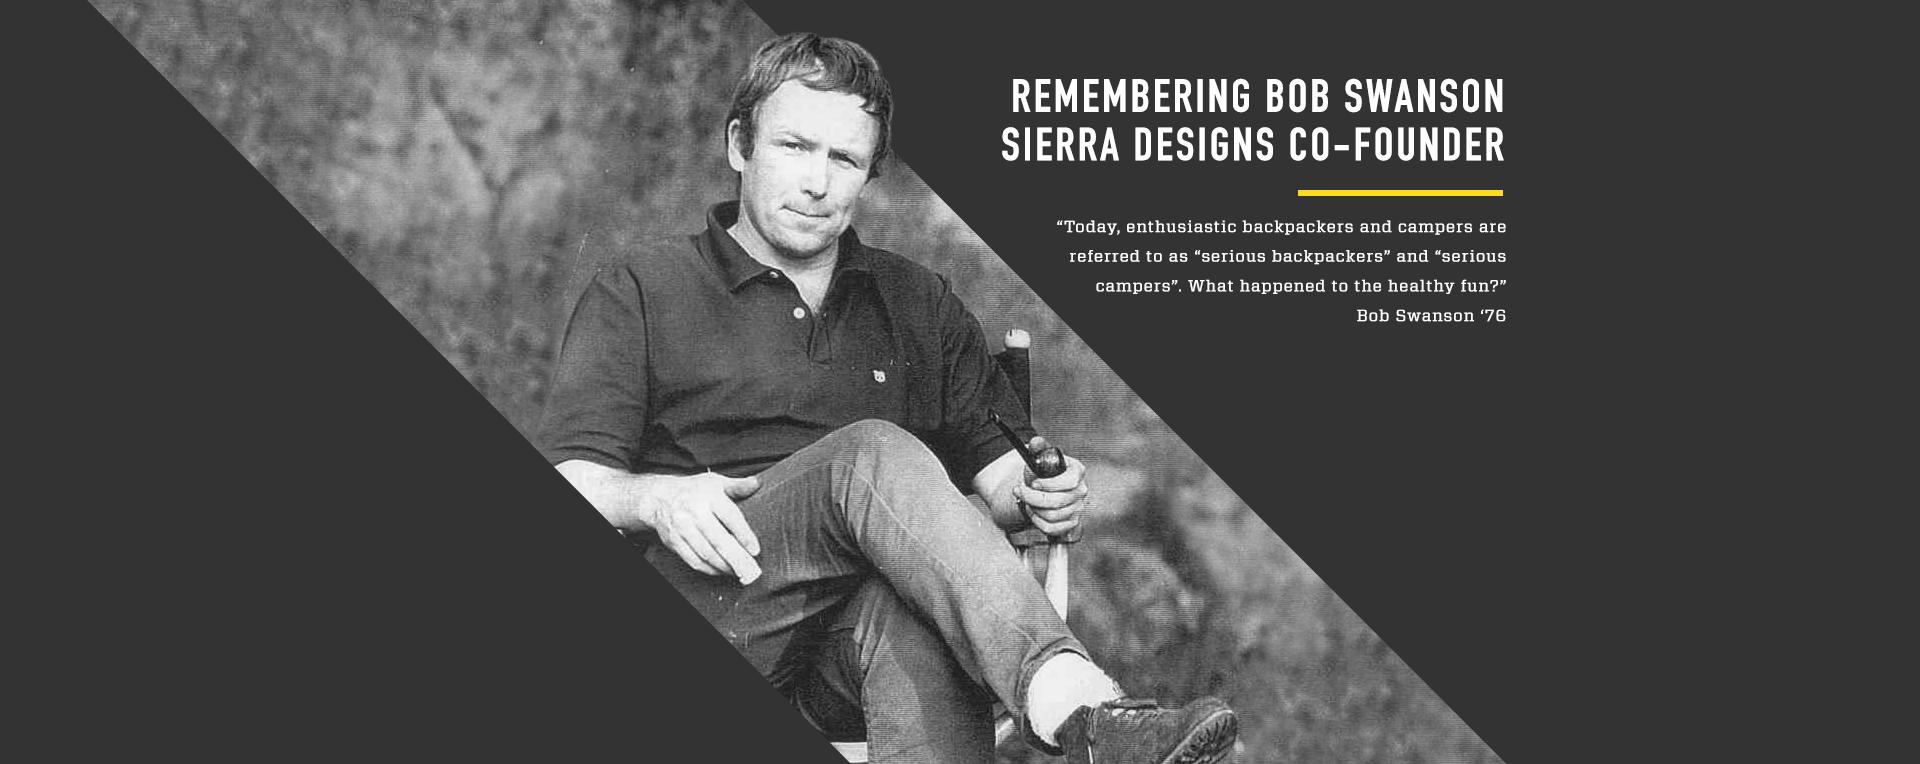 Remembering Bob Swanson